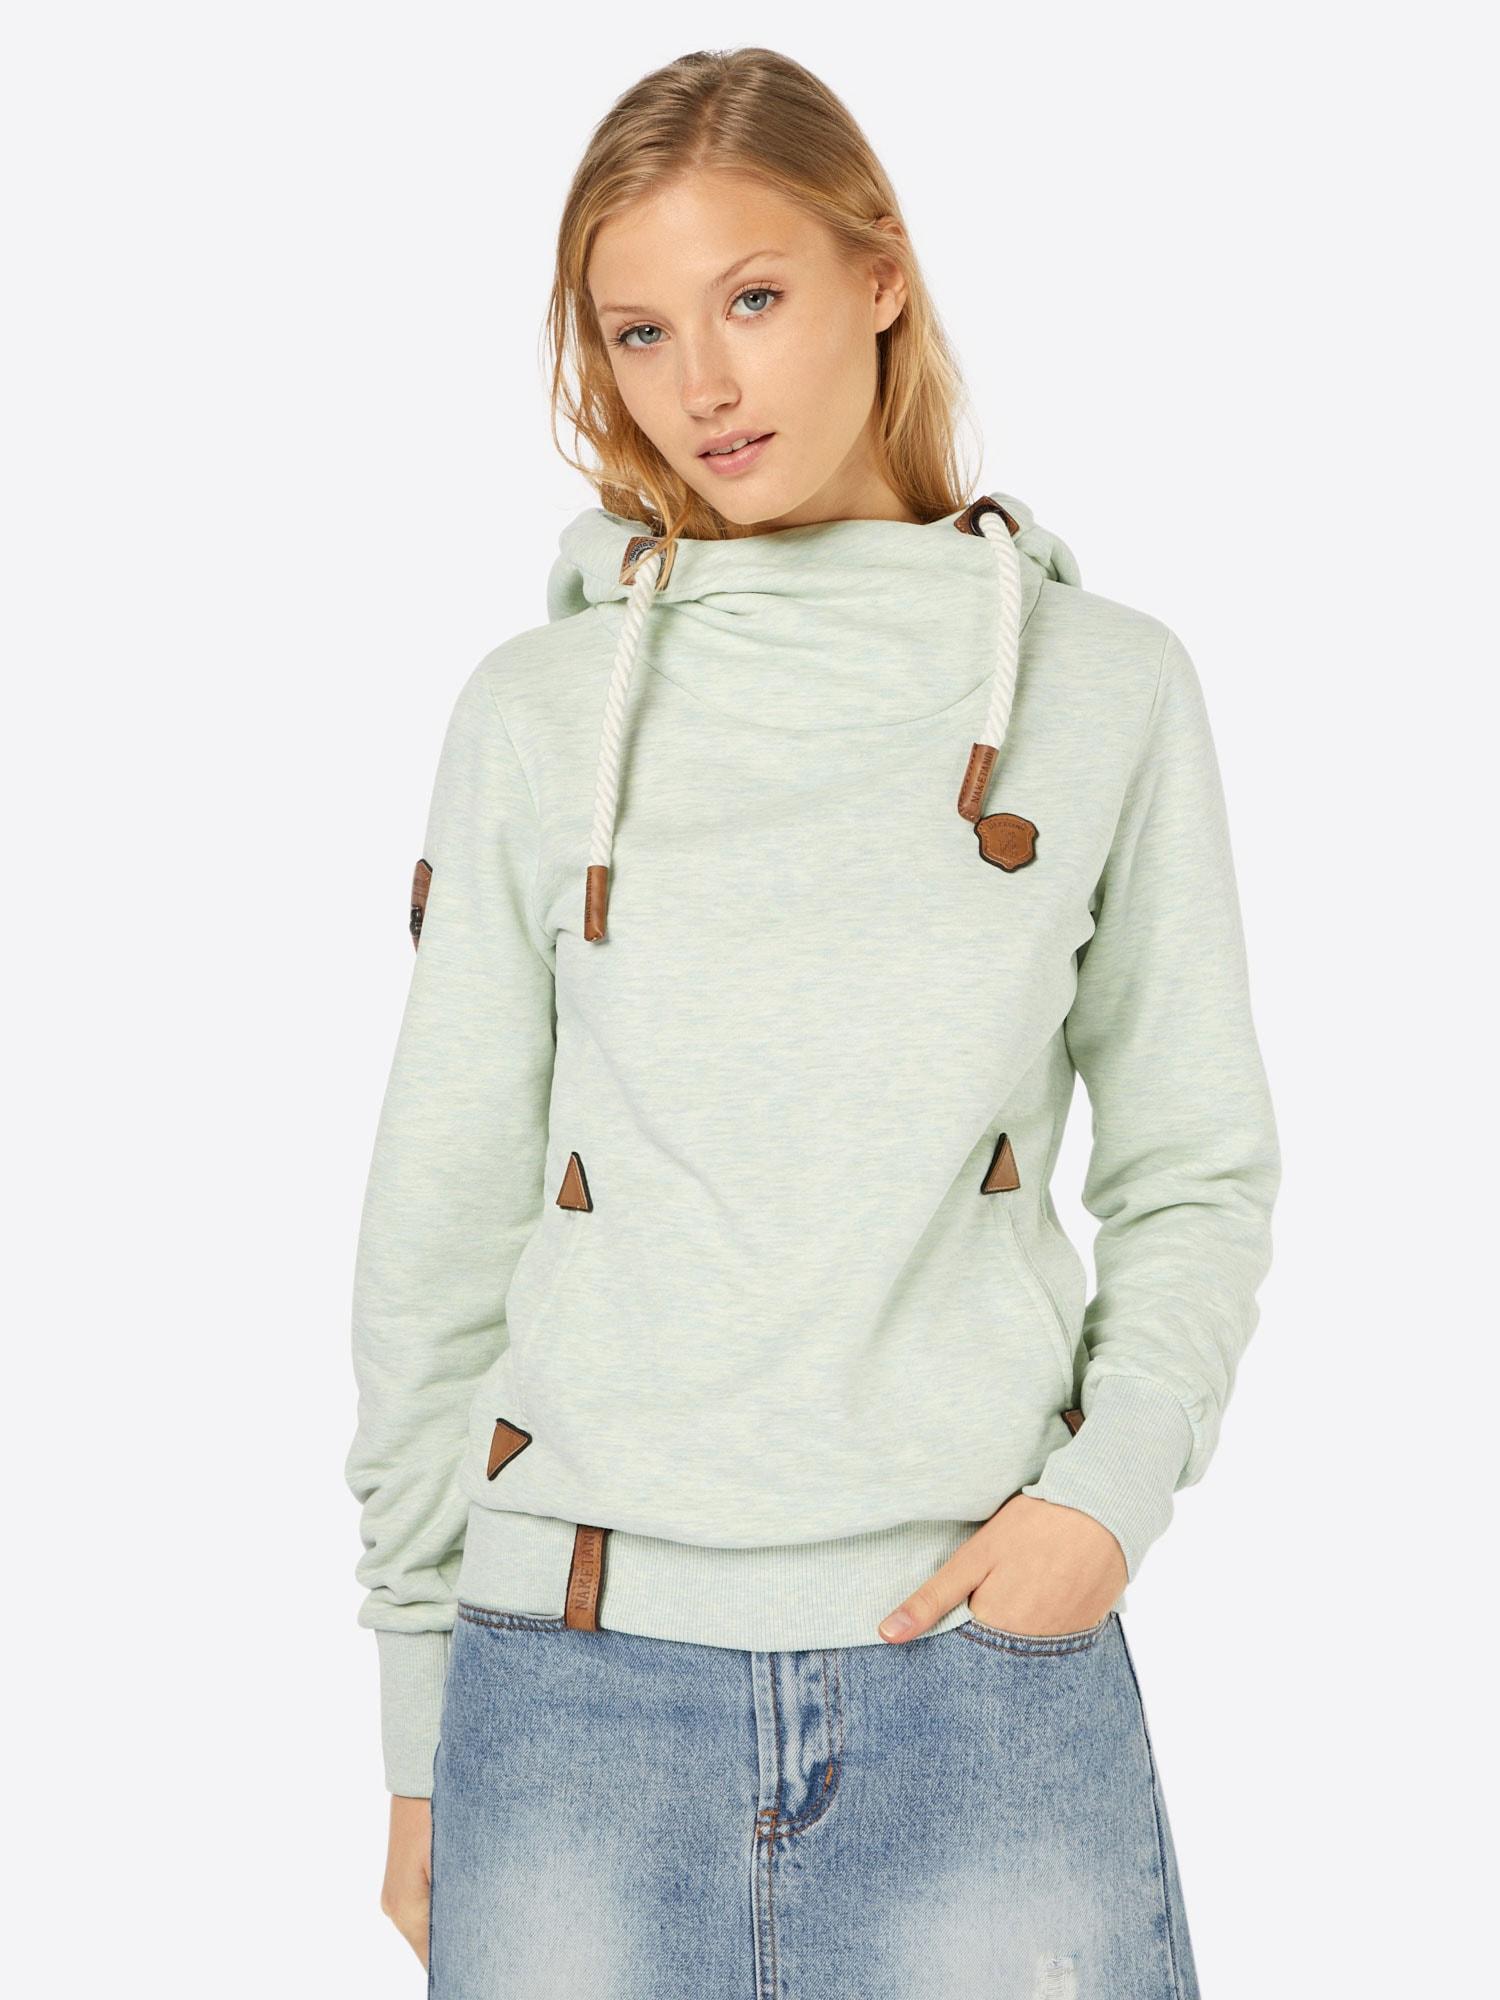 Sweatshirt 'Chasin the cat'